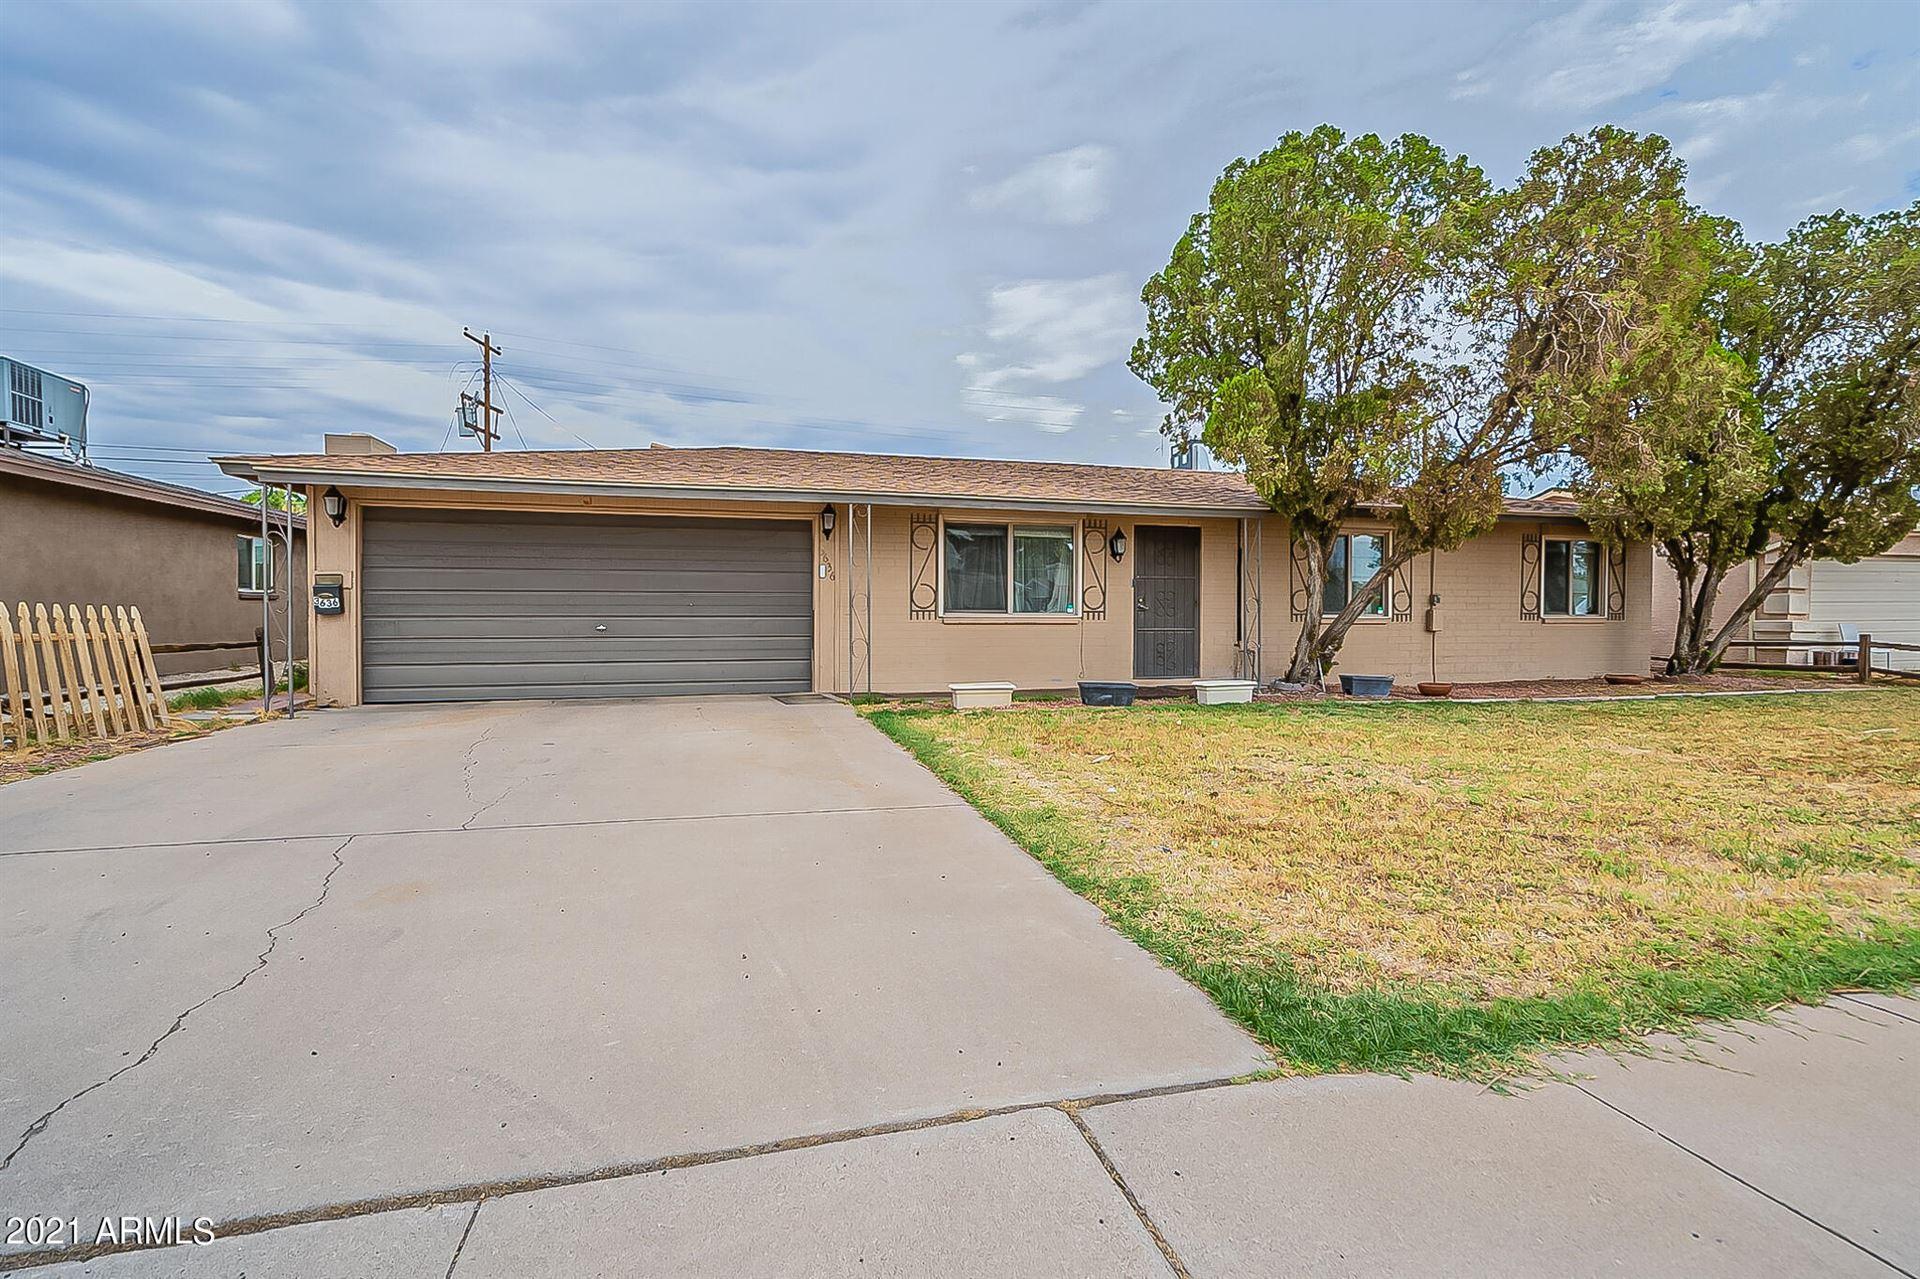 3636 W GEORGIA Avenue, Phoenix, AZ 85019 - MLS#: 6266418